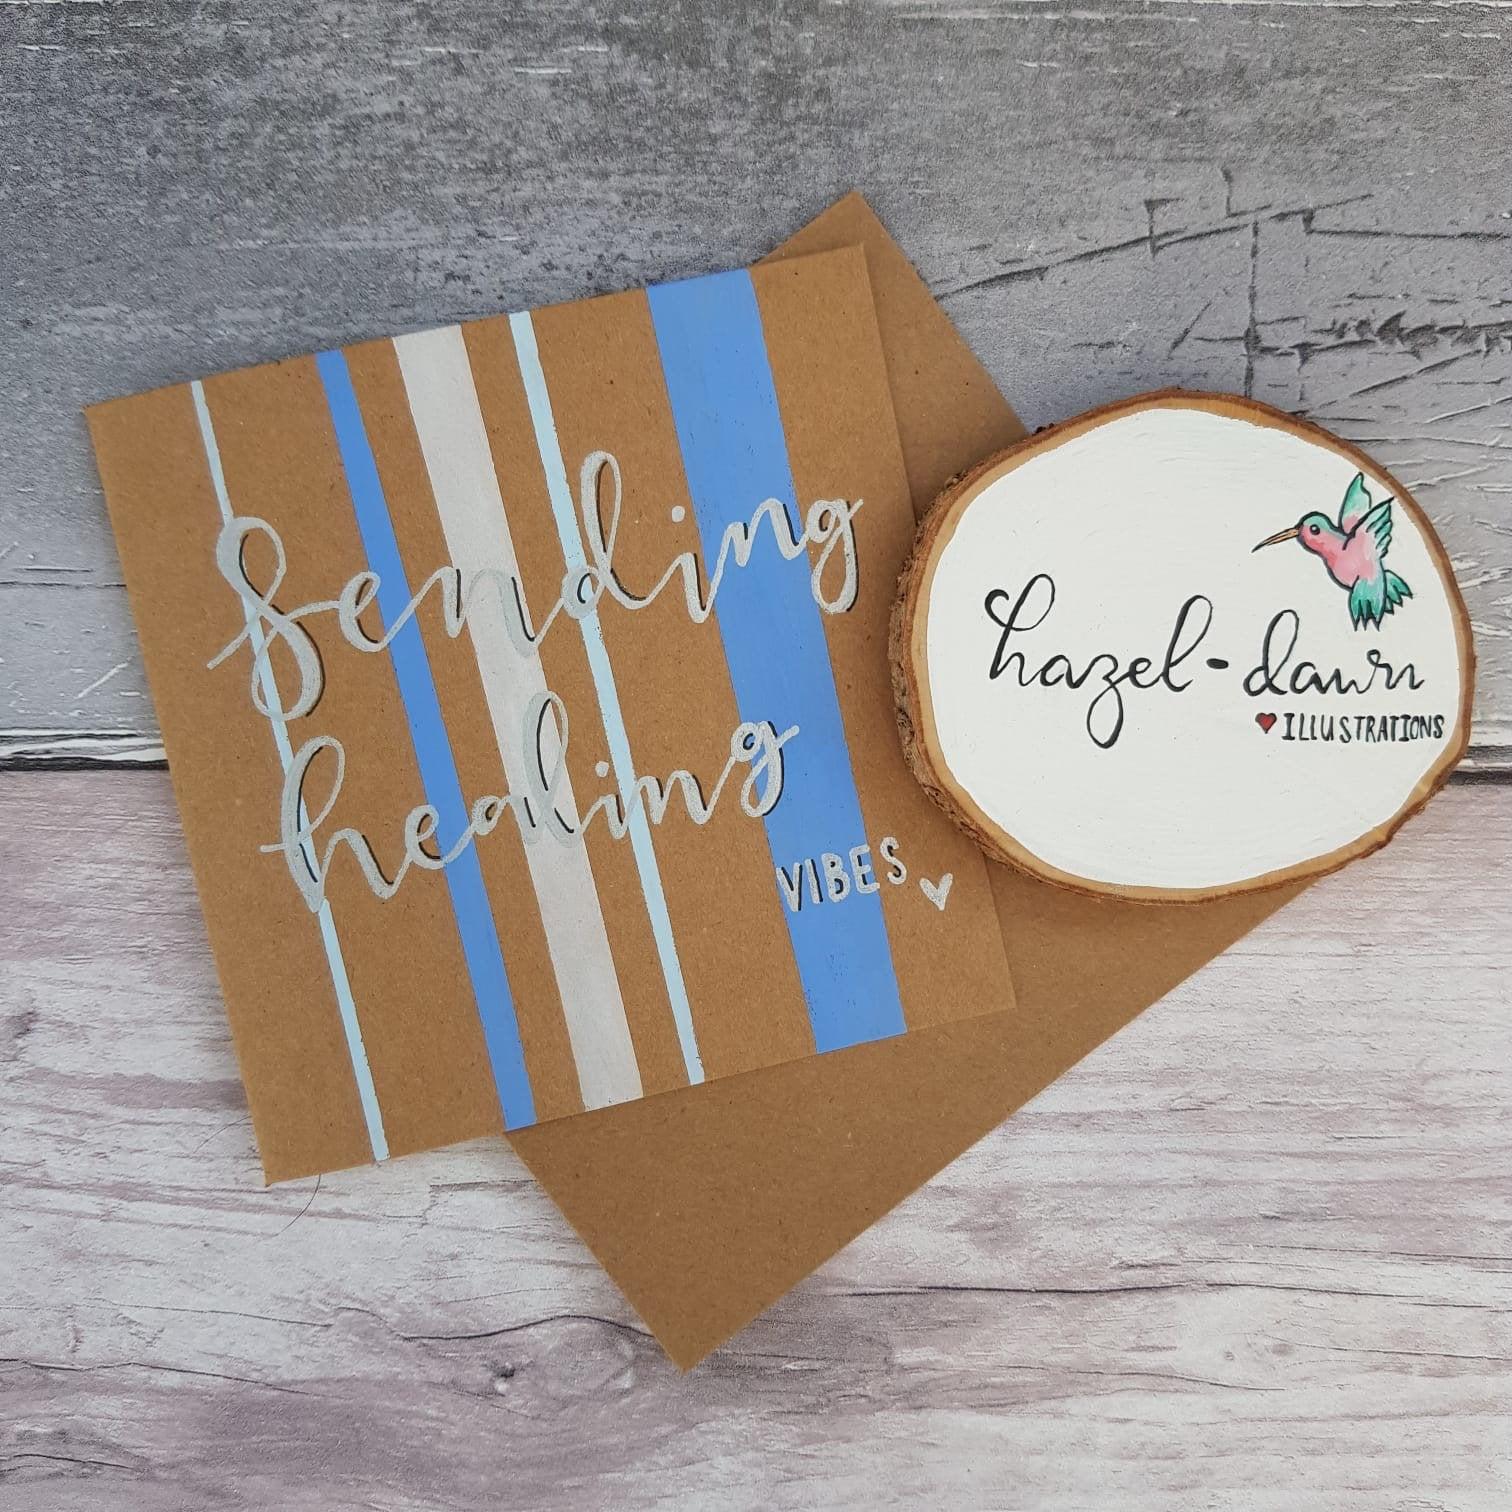 Sending Healing Vibes Card, Blank Card, Friendship, Motivation, Support – Handmade Kind Shop